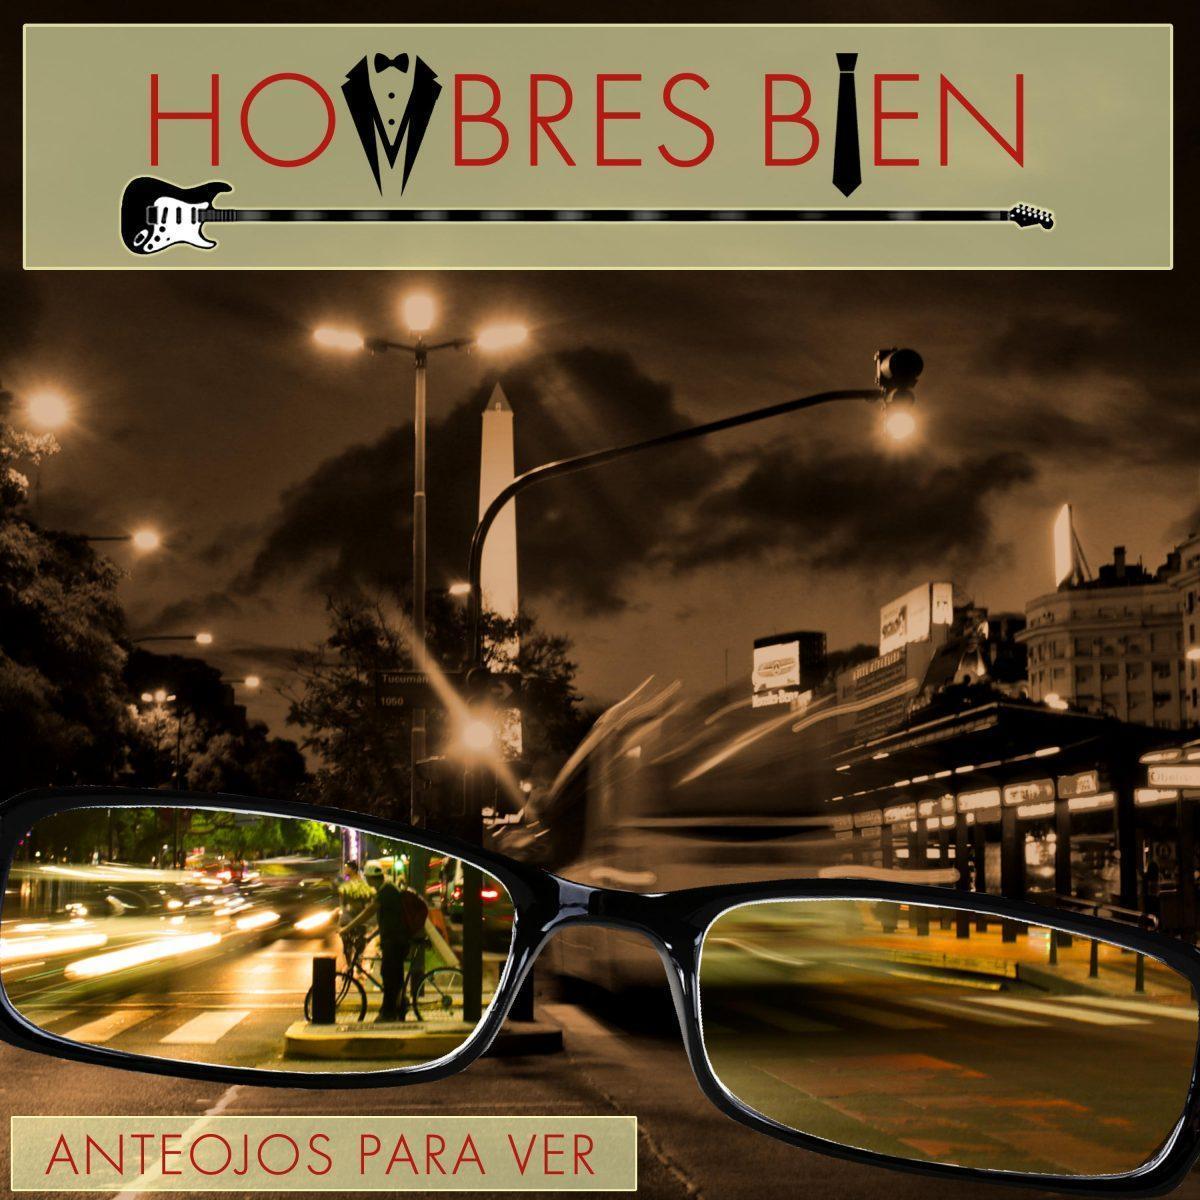 EP - Anteojos para ver